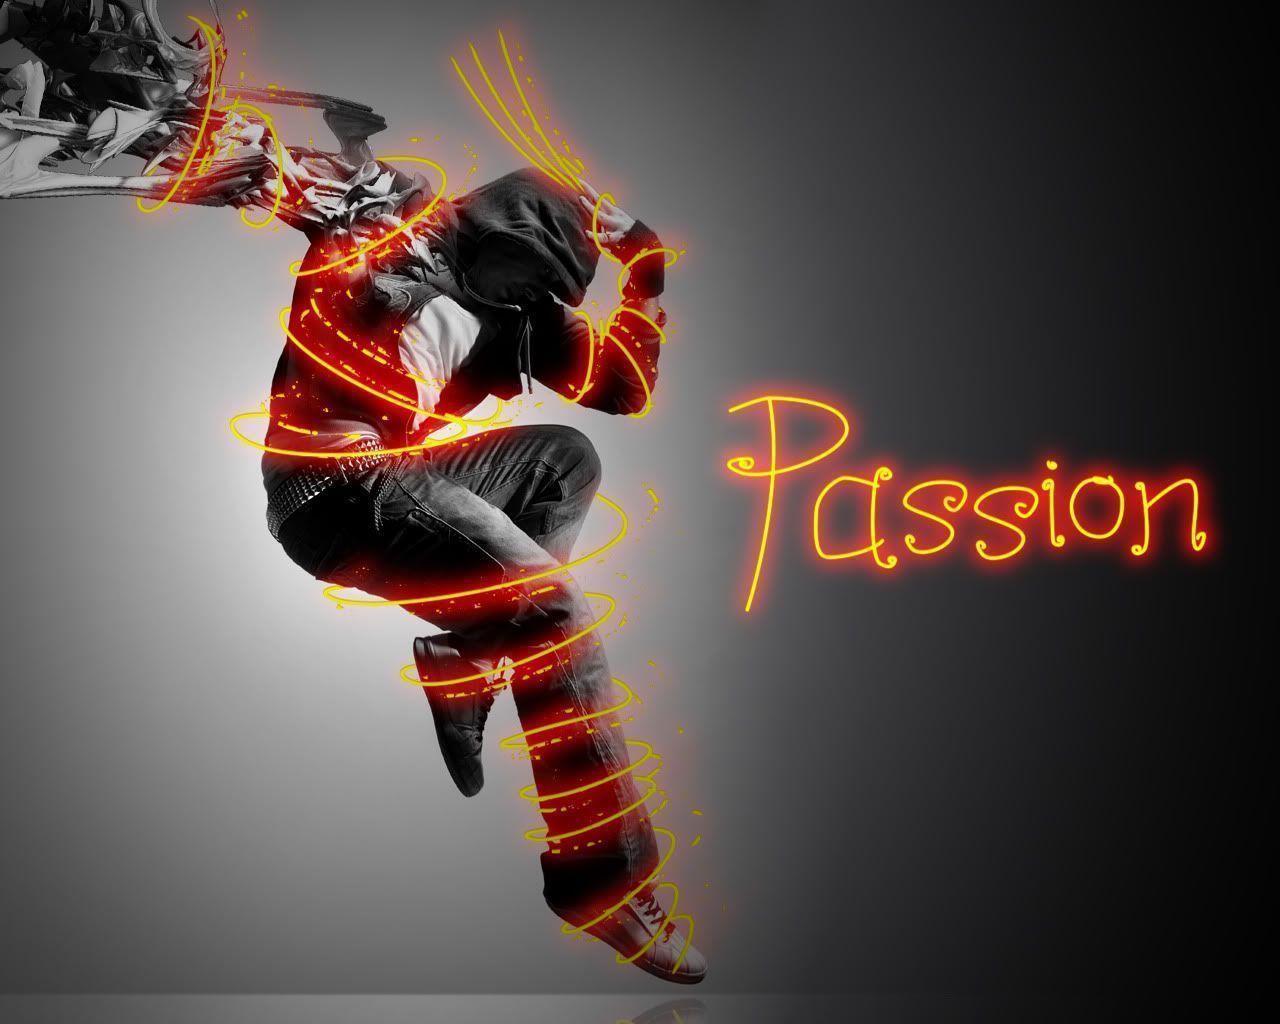 passion wallpaper forwallpapercom - photo #11